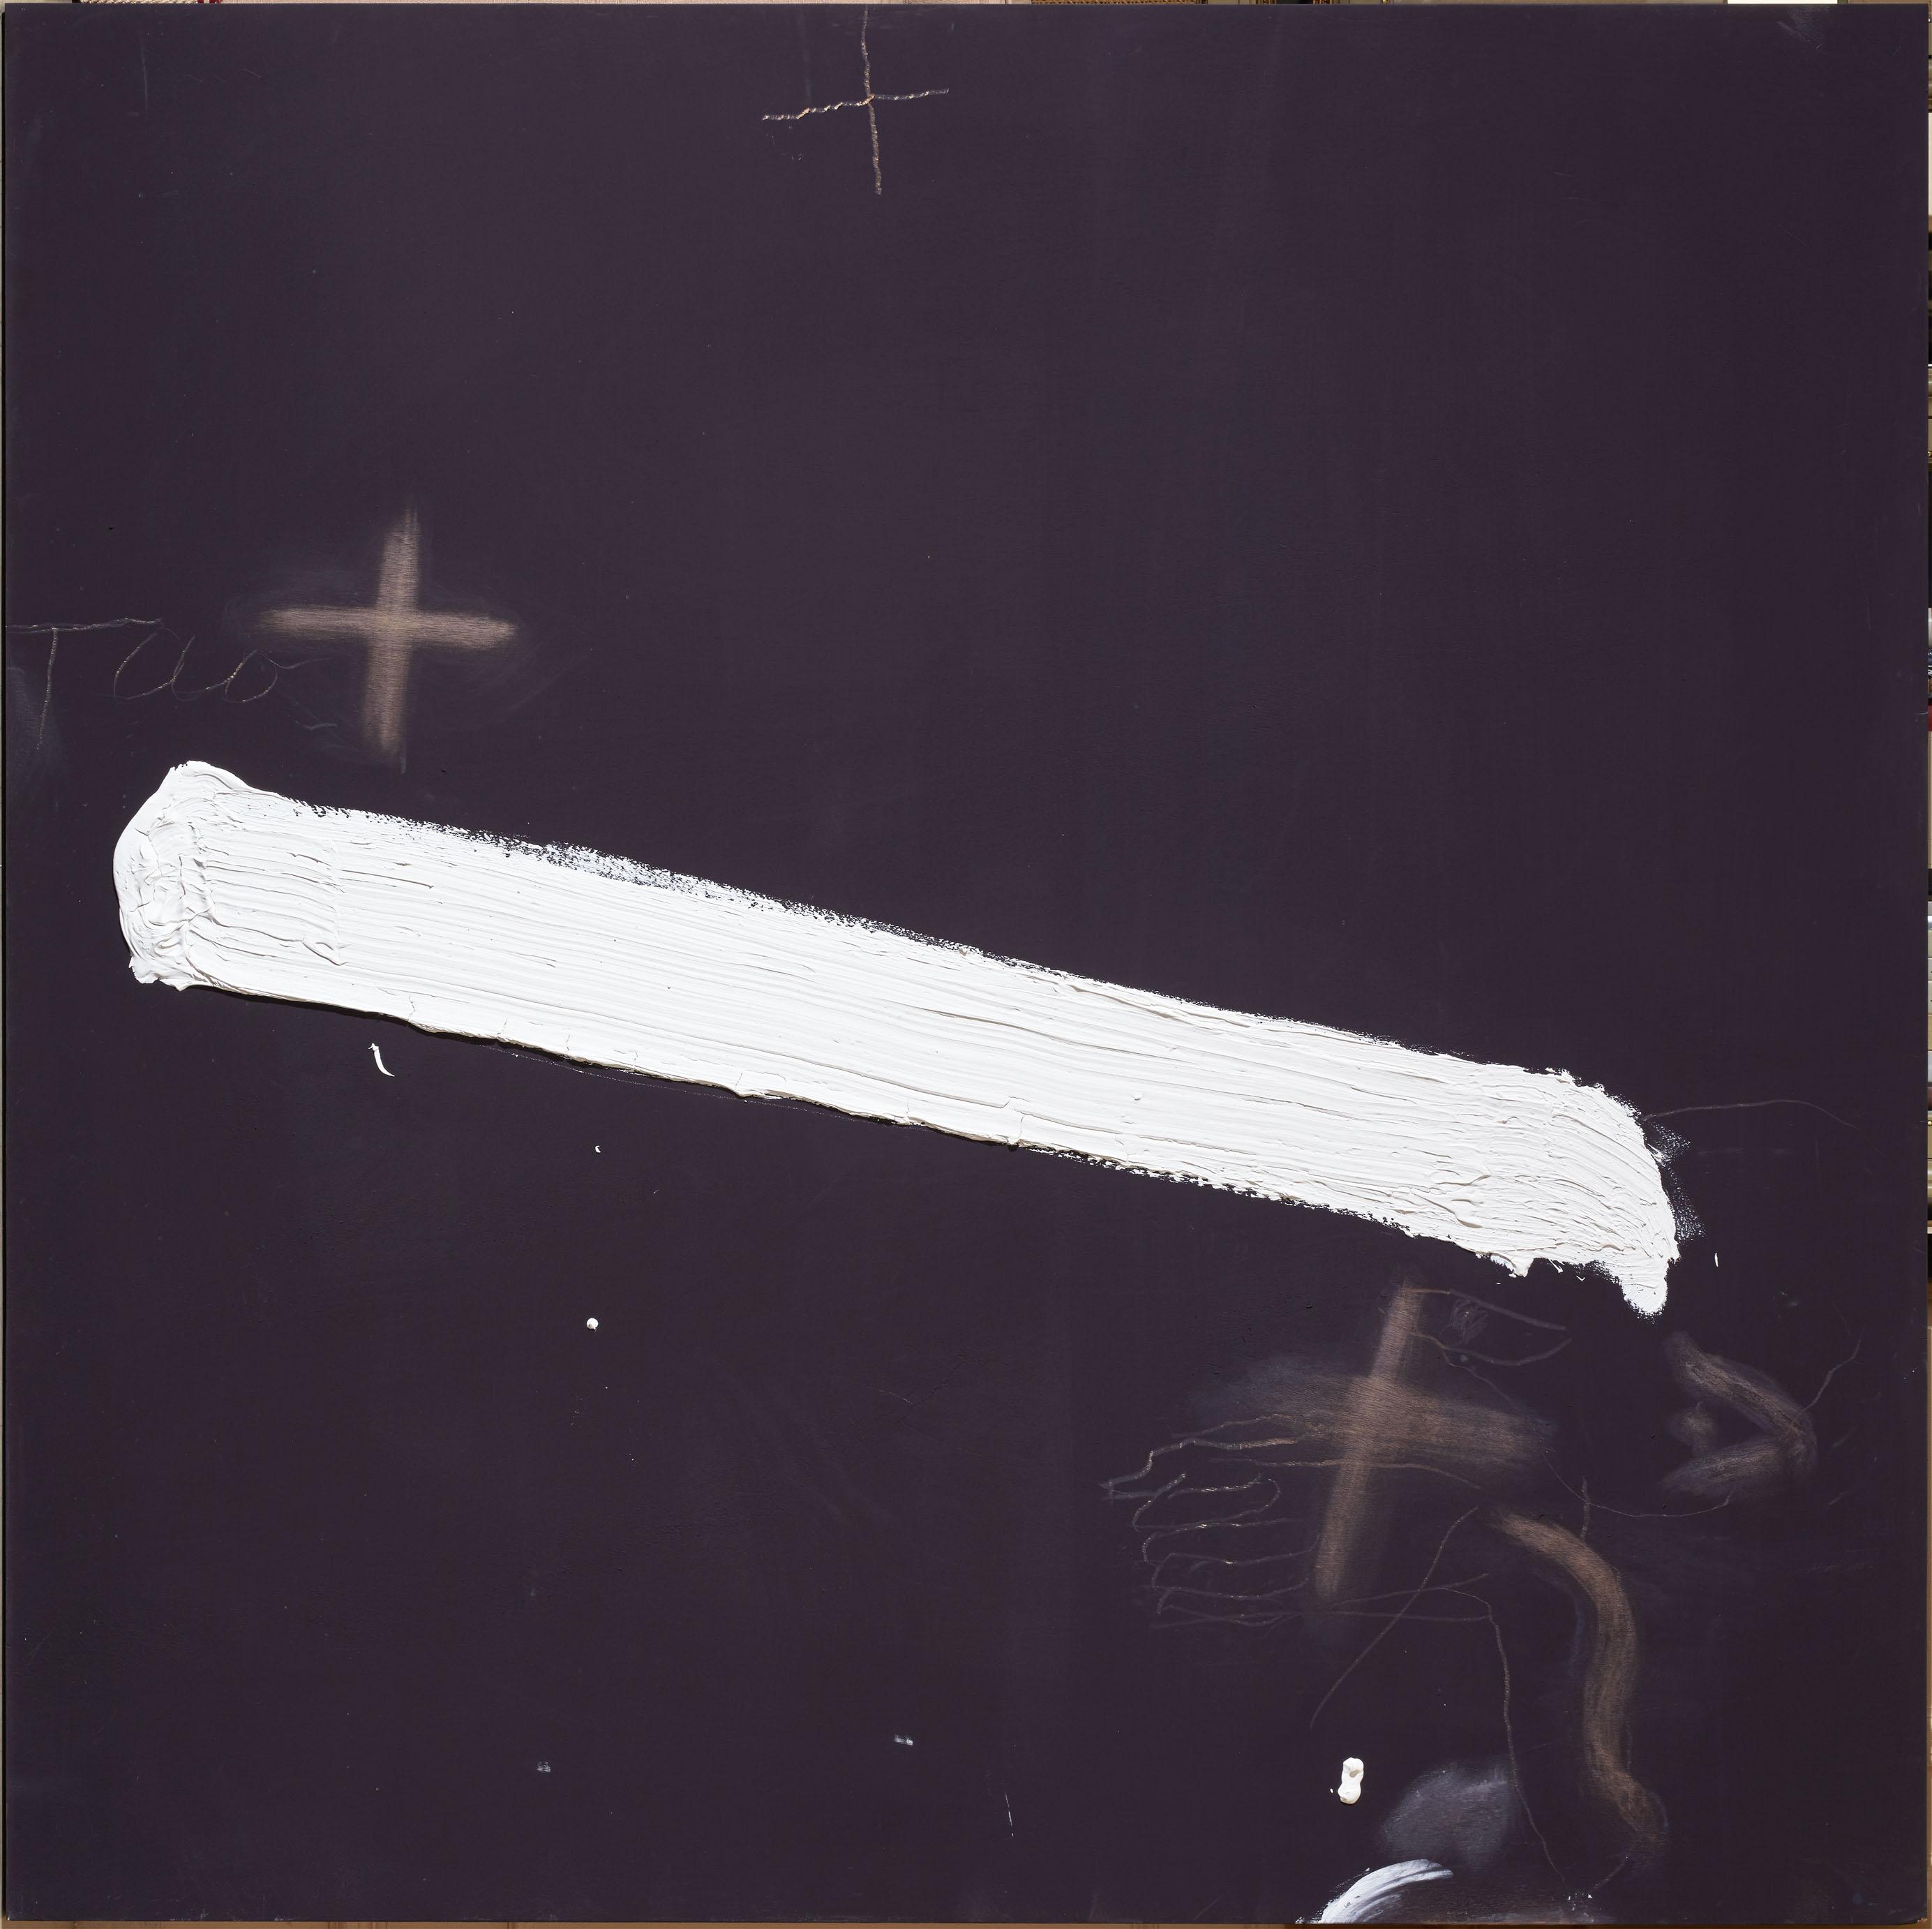 Banda blanca (2007) - Antoni Tàpies